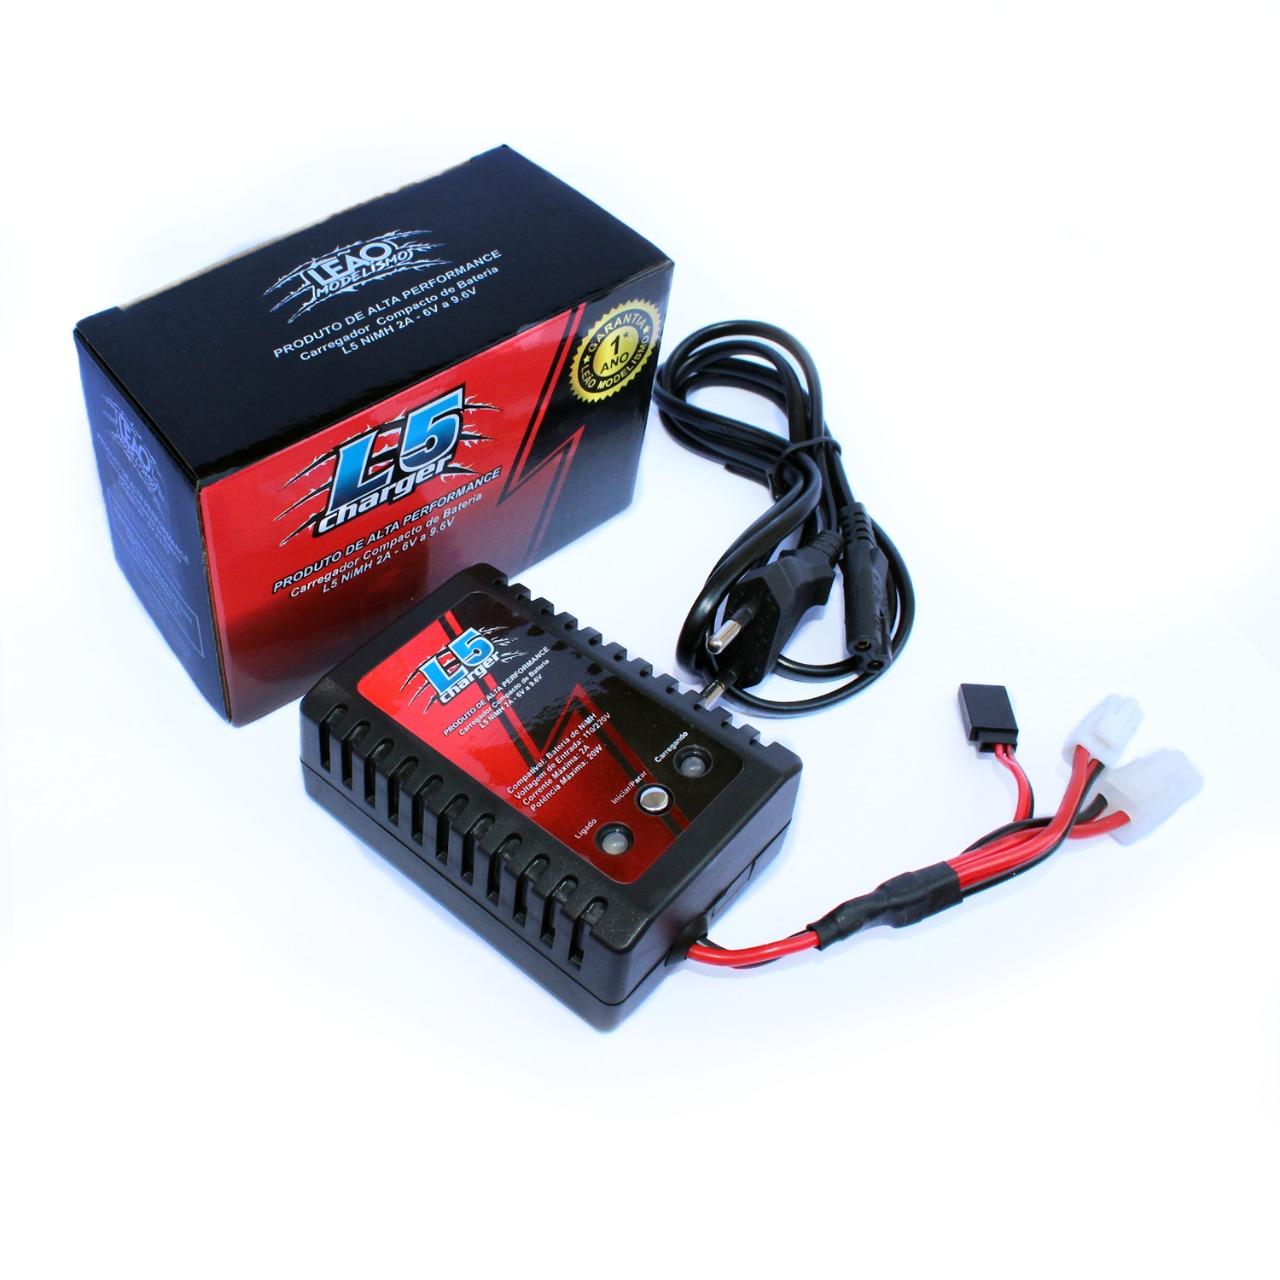 Carregador Compacto de Bateria Leão L5 2A NiMh 6V a 9.6V